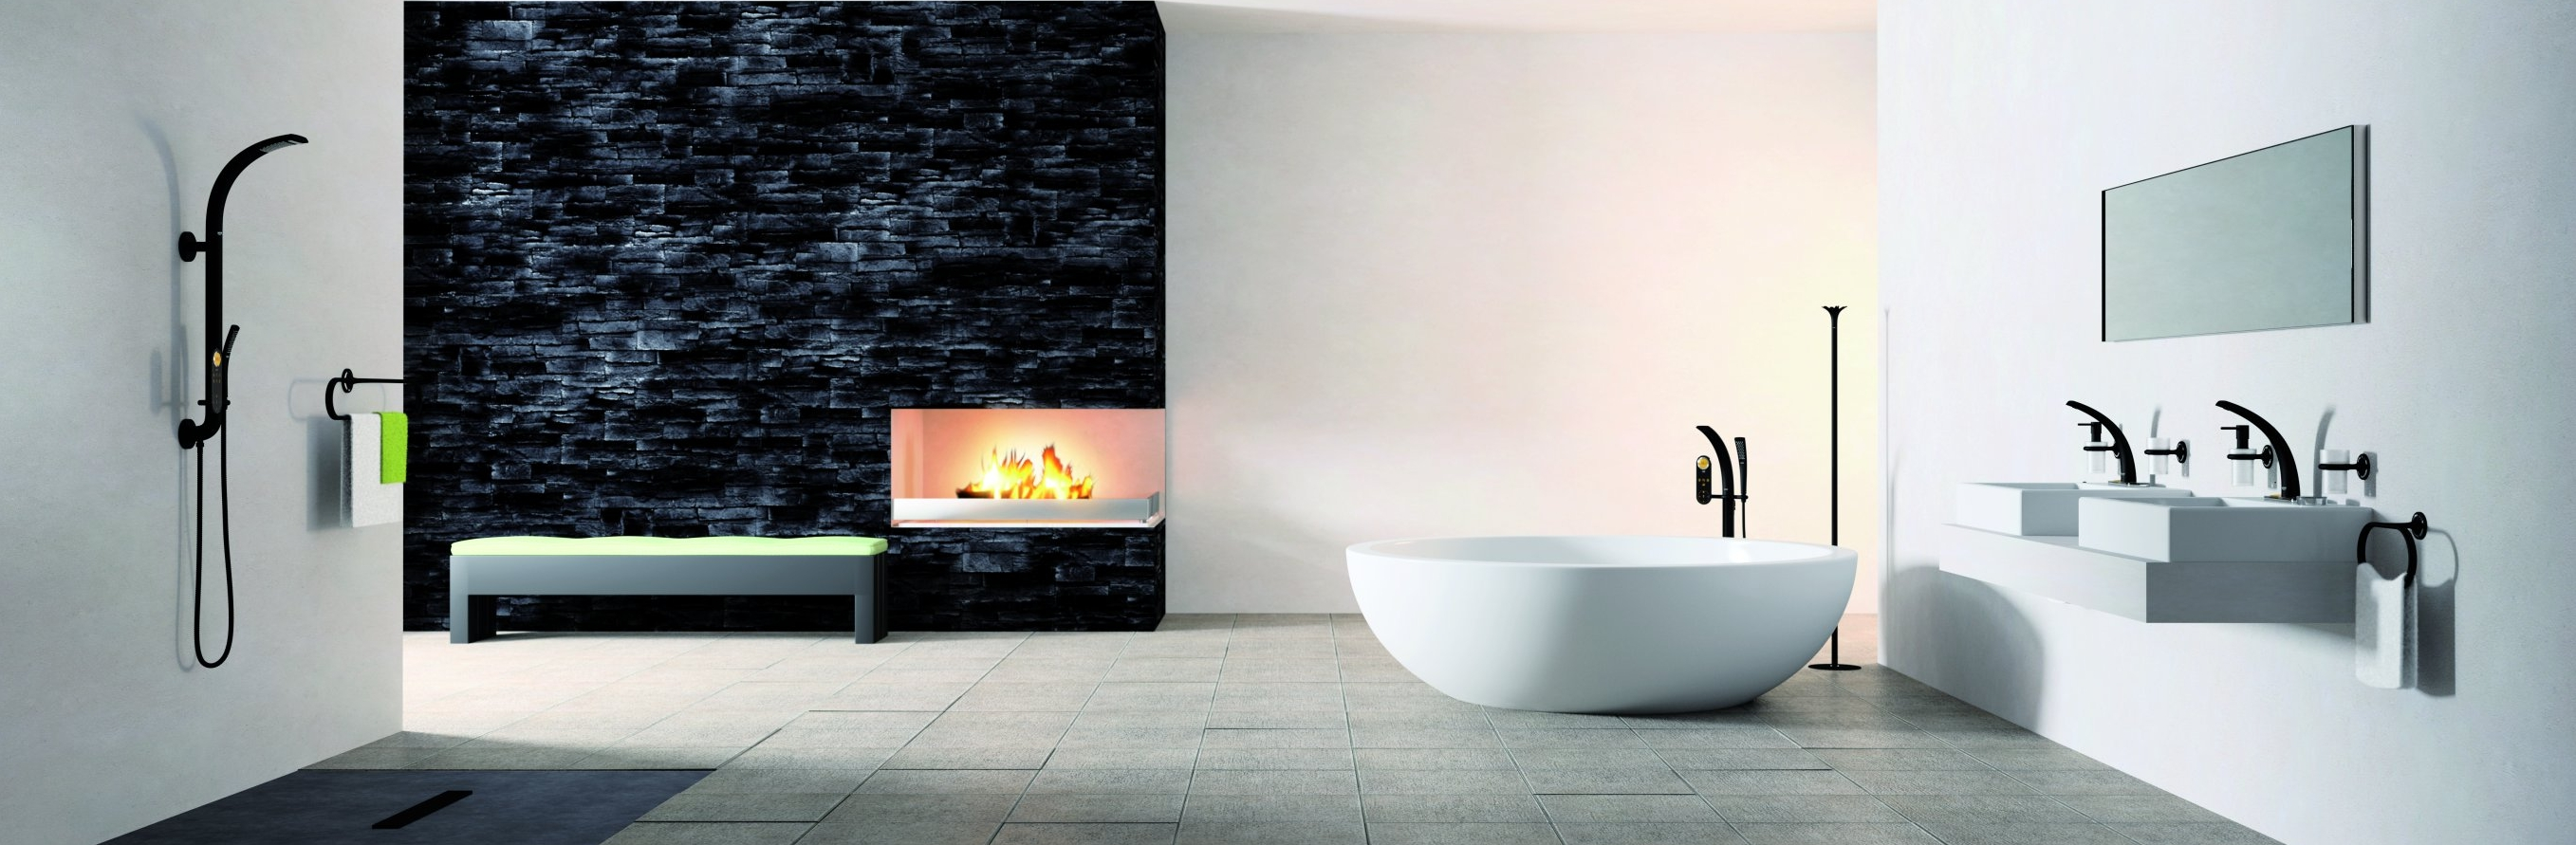 Salle de bain de r ve arzeo bathroom designer for Salle de bain de reve